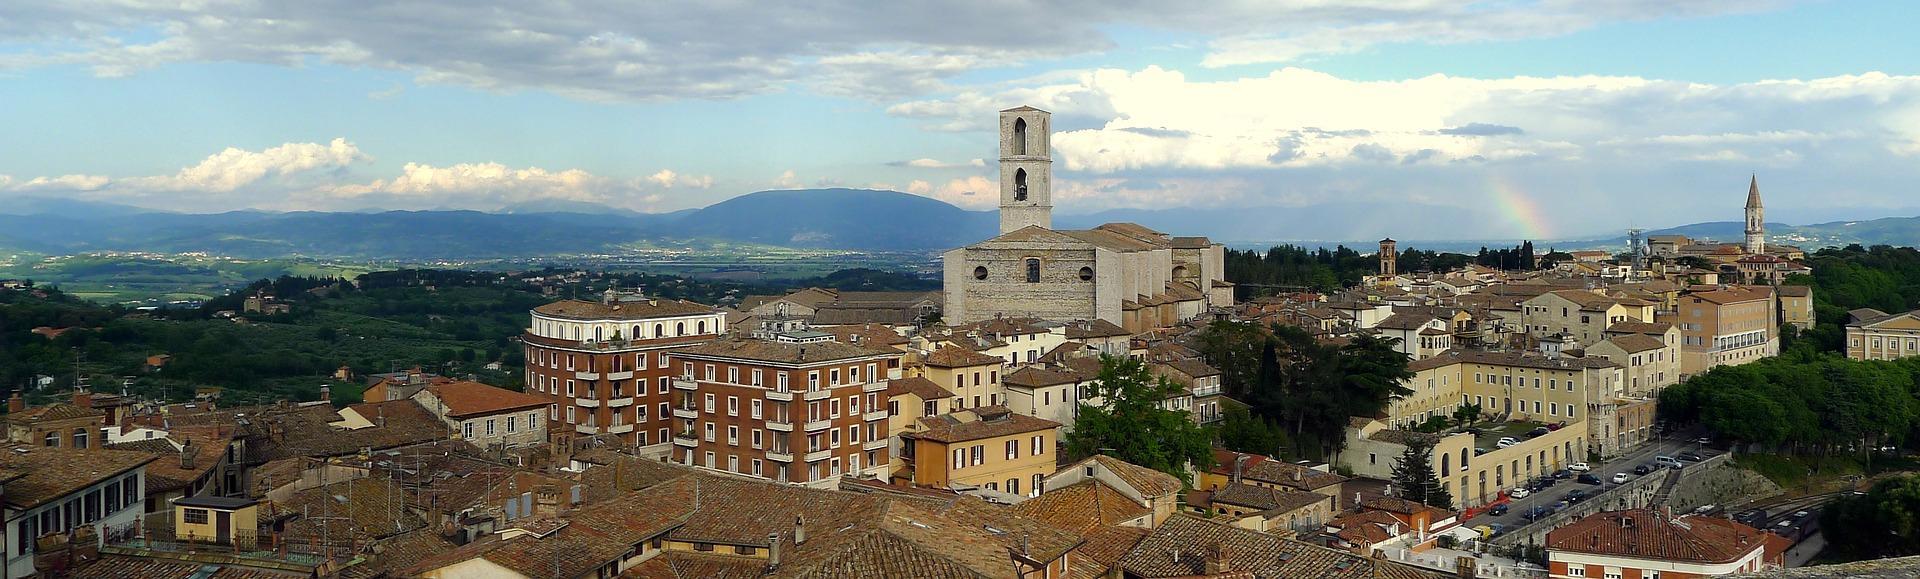 Convocazione di Assemblea Provinciale Straordinaria Elettiva A S C  Perugia